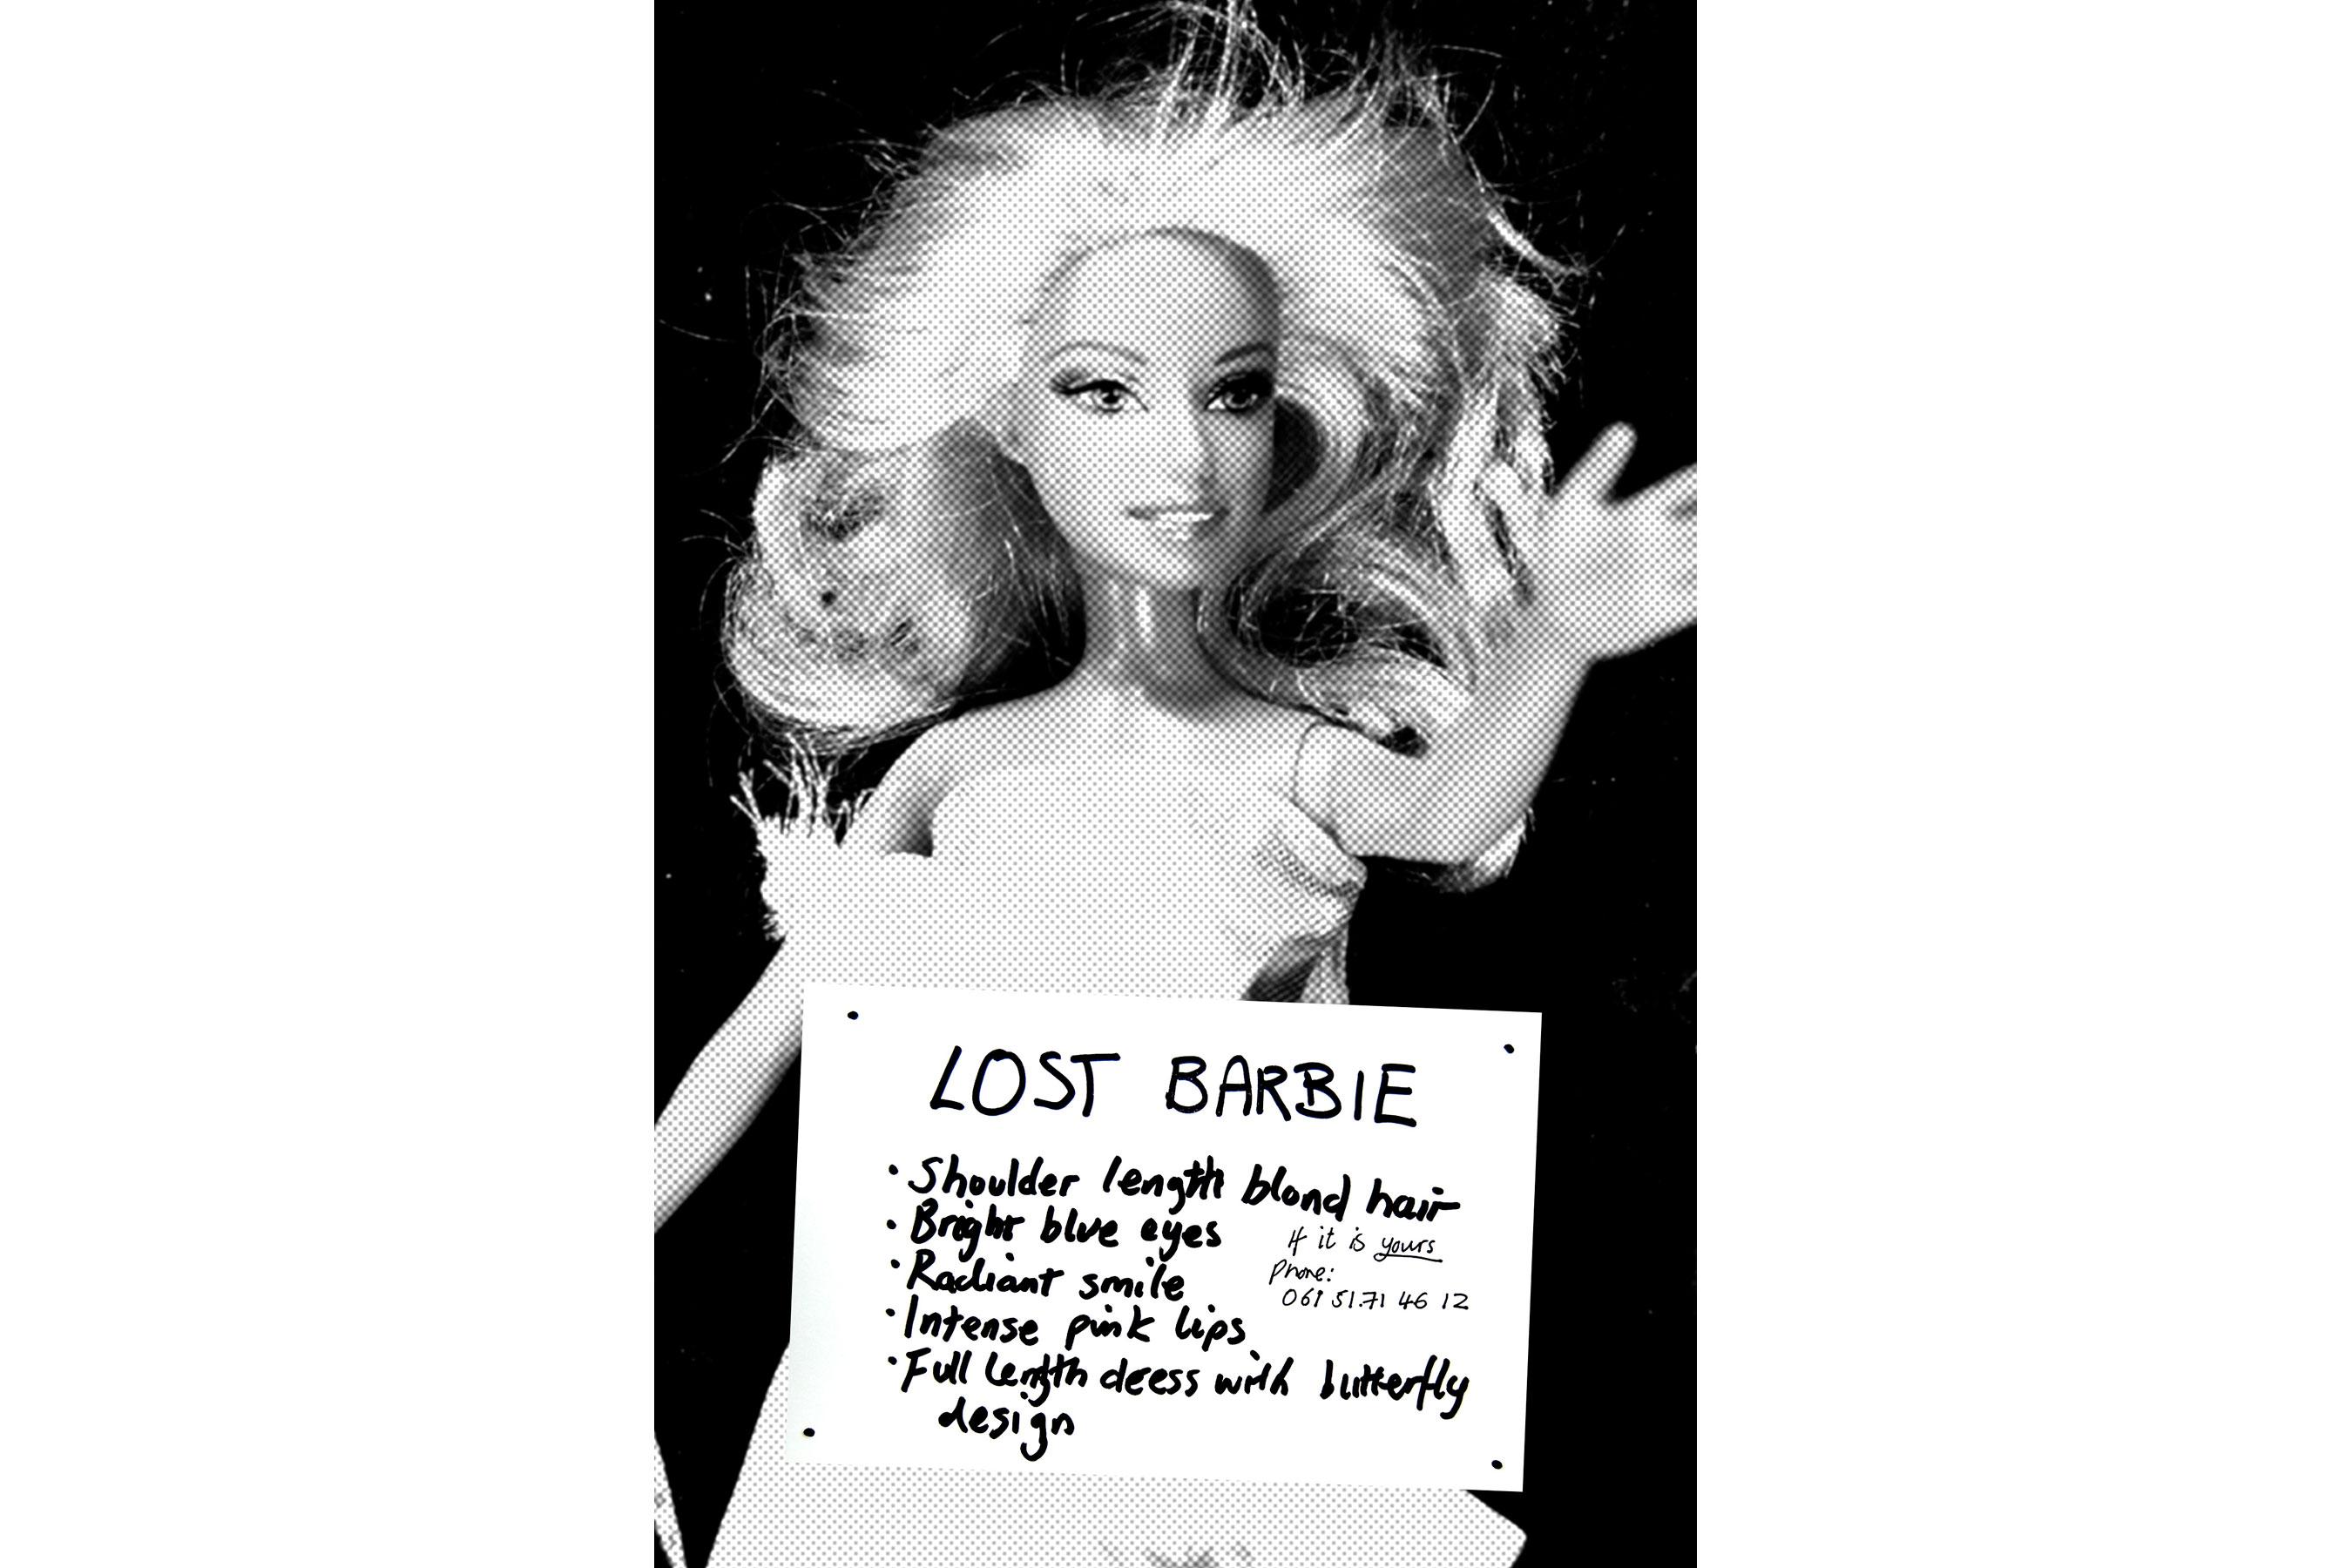 barbieposter